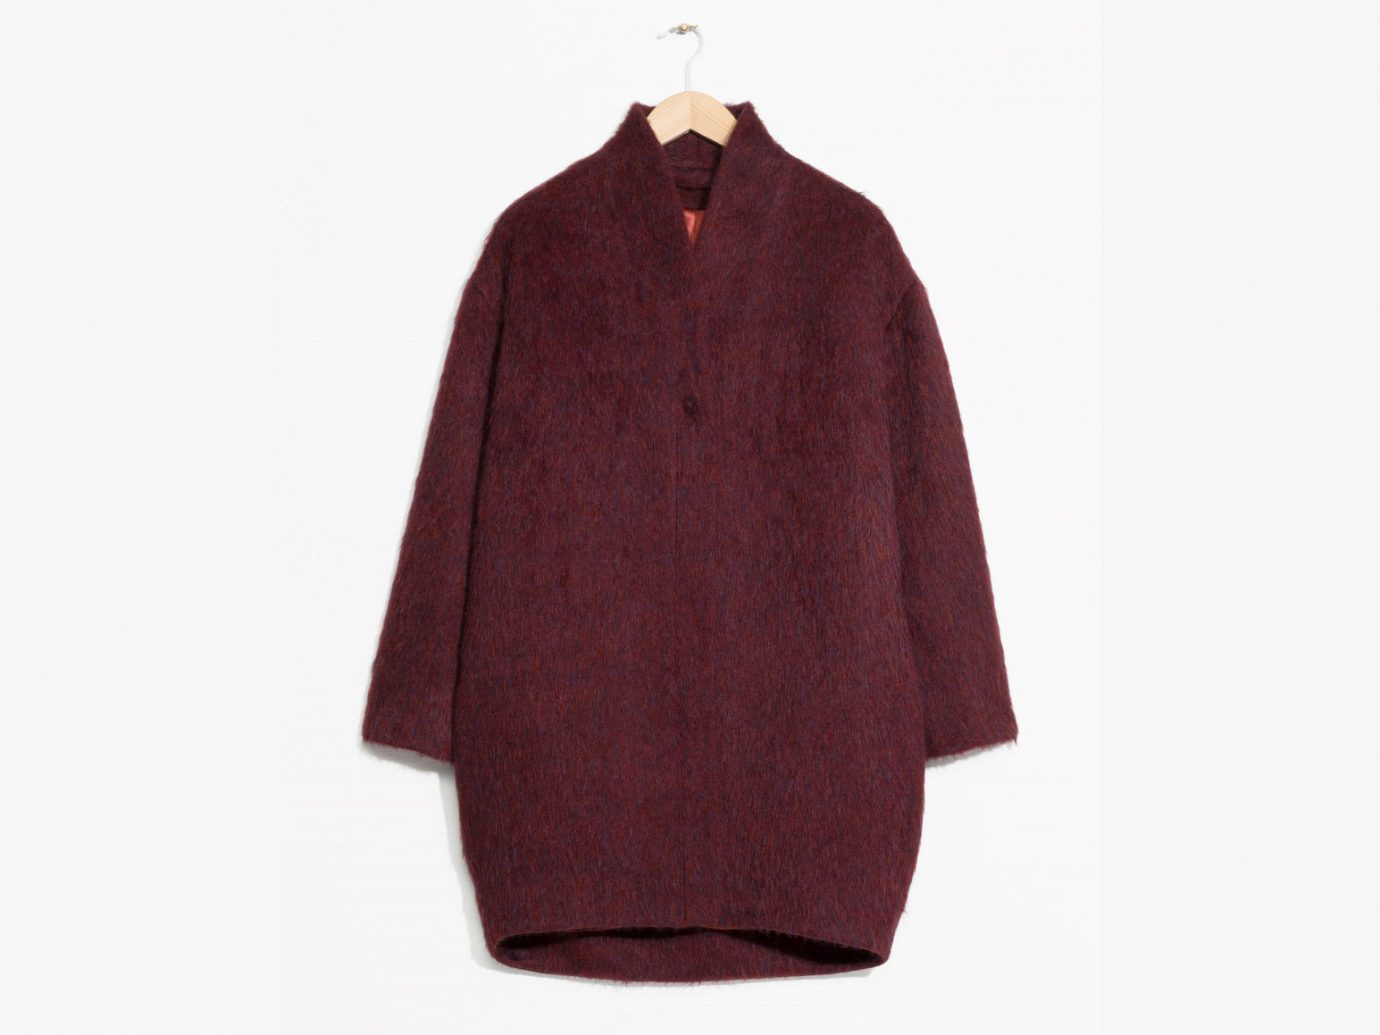 City NYC Style + Design Travel Shop clothing maroon woolen coat sleeve neck